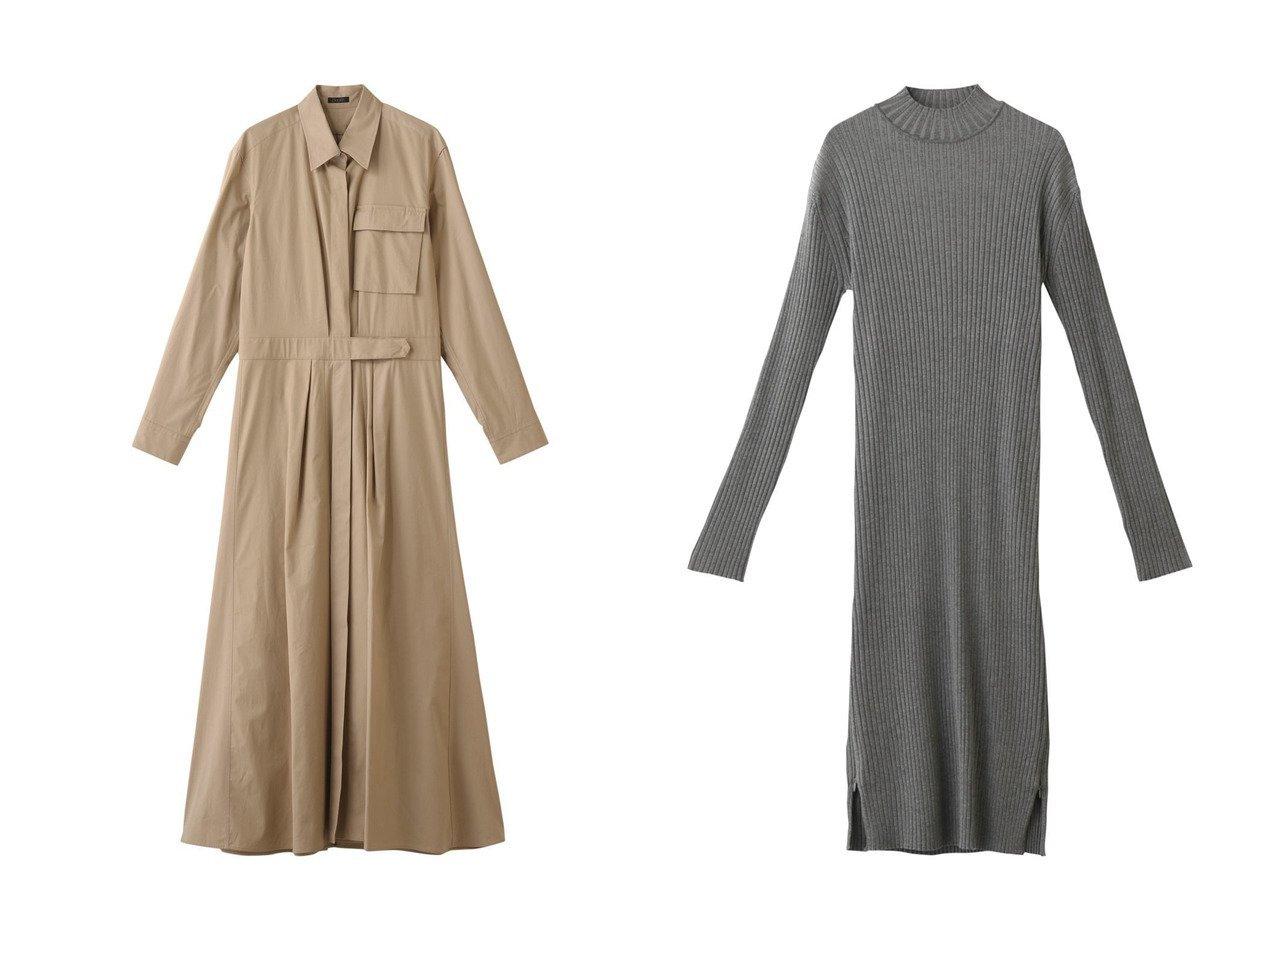 【LE CIEL BLEU/ルシェル ブルー】のツイストリブニットドレス&【DESIGN WORKS/デザイン ワークス】のロングシャツワンピース 【ワンピース・ドレス】おすすめ!人気、トレンド・レディースファッションの通販  おすすめで人気の流行・トレンド、ファッションの通販商品 メンズファッション・キッズファッション・インテリア・家具・レディースファッション・服の通販 founy(ファニー) https://founy.com/ ファッション Fashion レディースファッション WOMEN ワンピース Dress シャツワンピース Shirt Dresses ドレス Party Dresses シルク シンプル スタイリッシュ パーティ フィット |ID:crp329100000032182